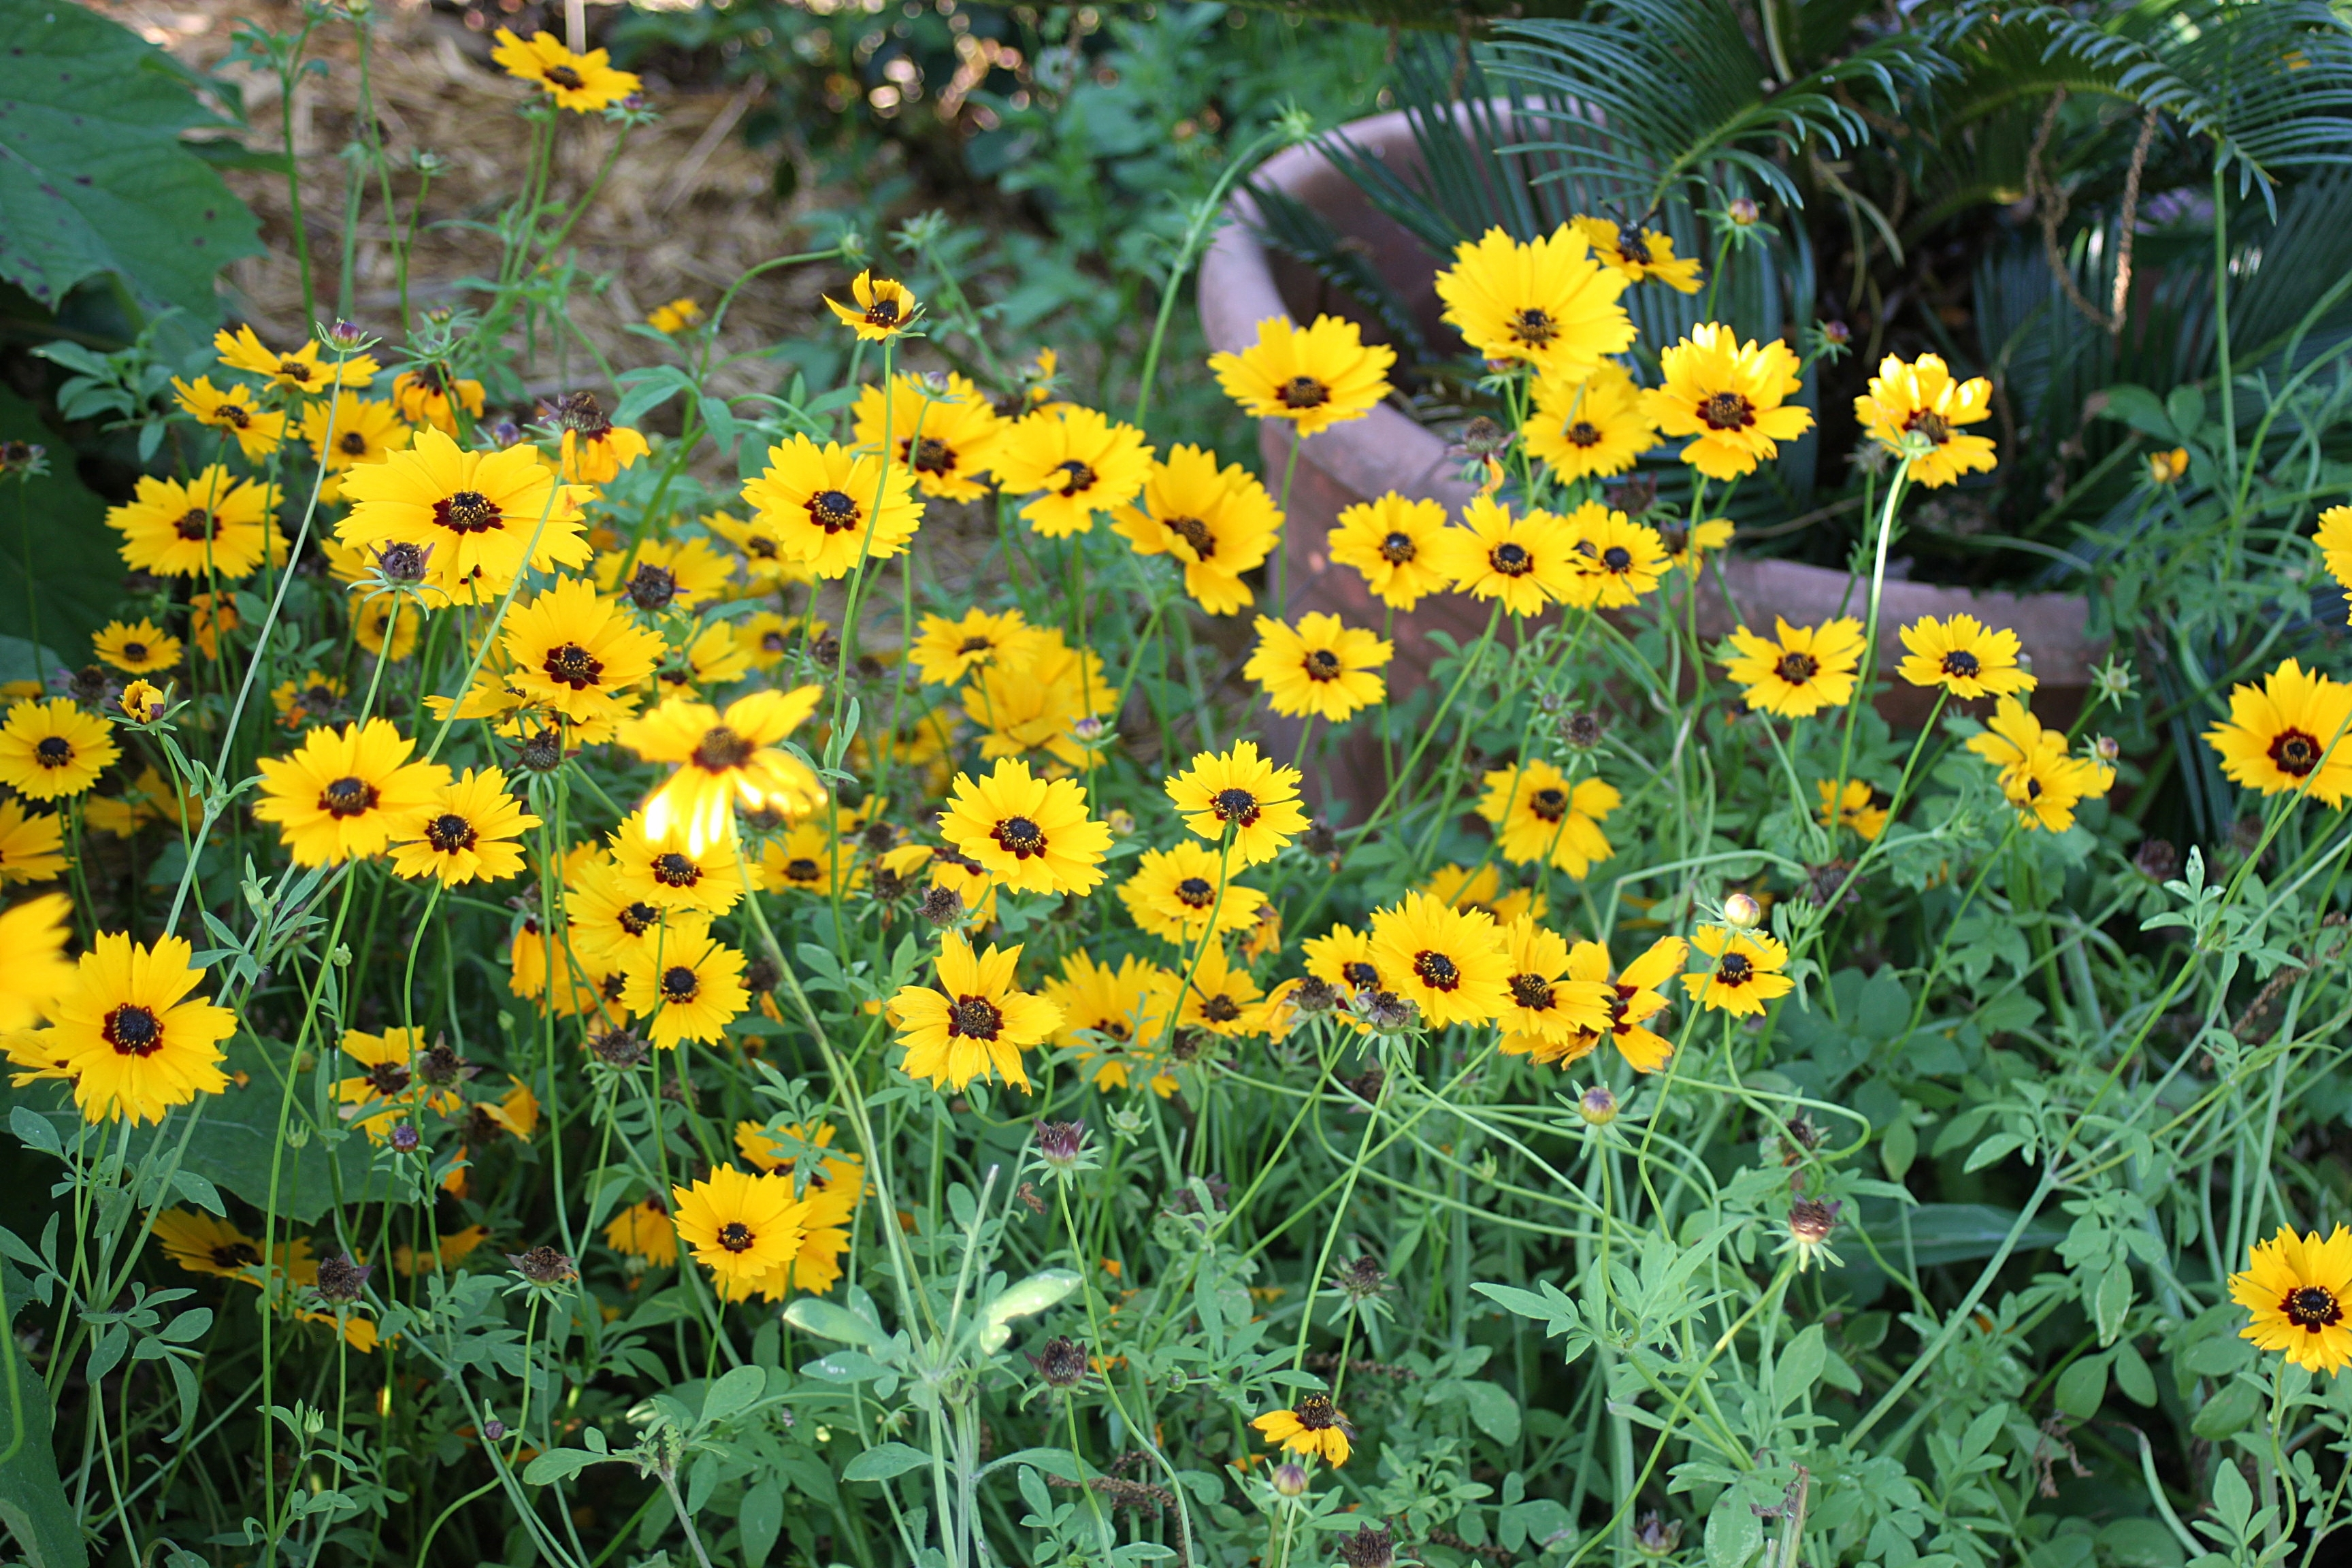 The guilford garden of hartford alabama beautifulgardener img9721 dhlflorist Image collections